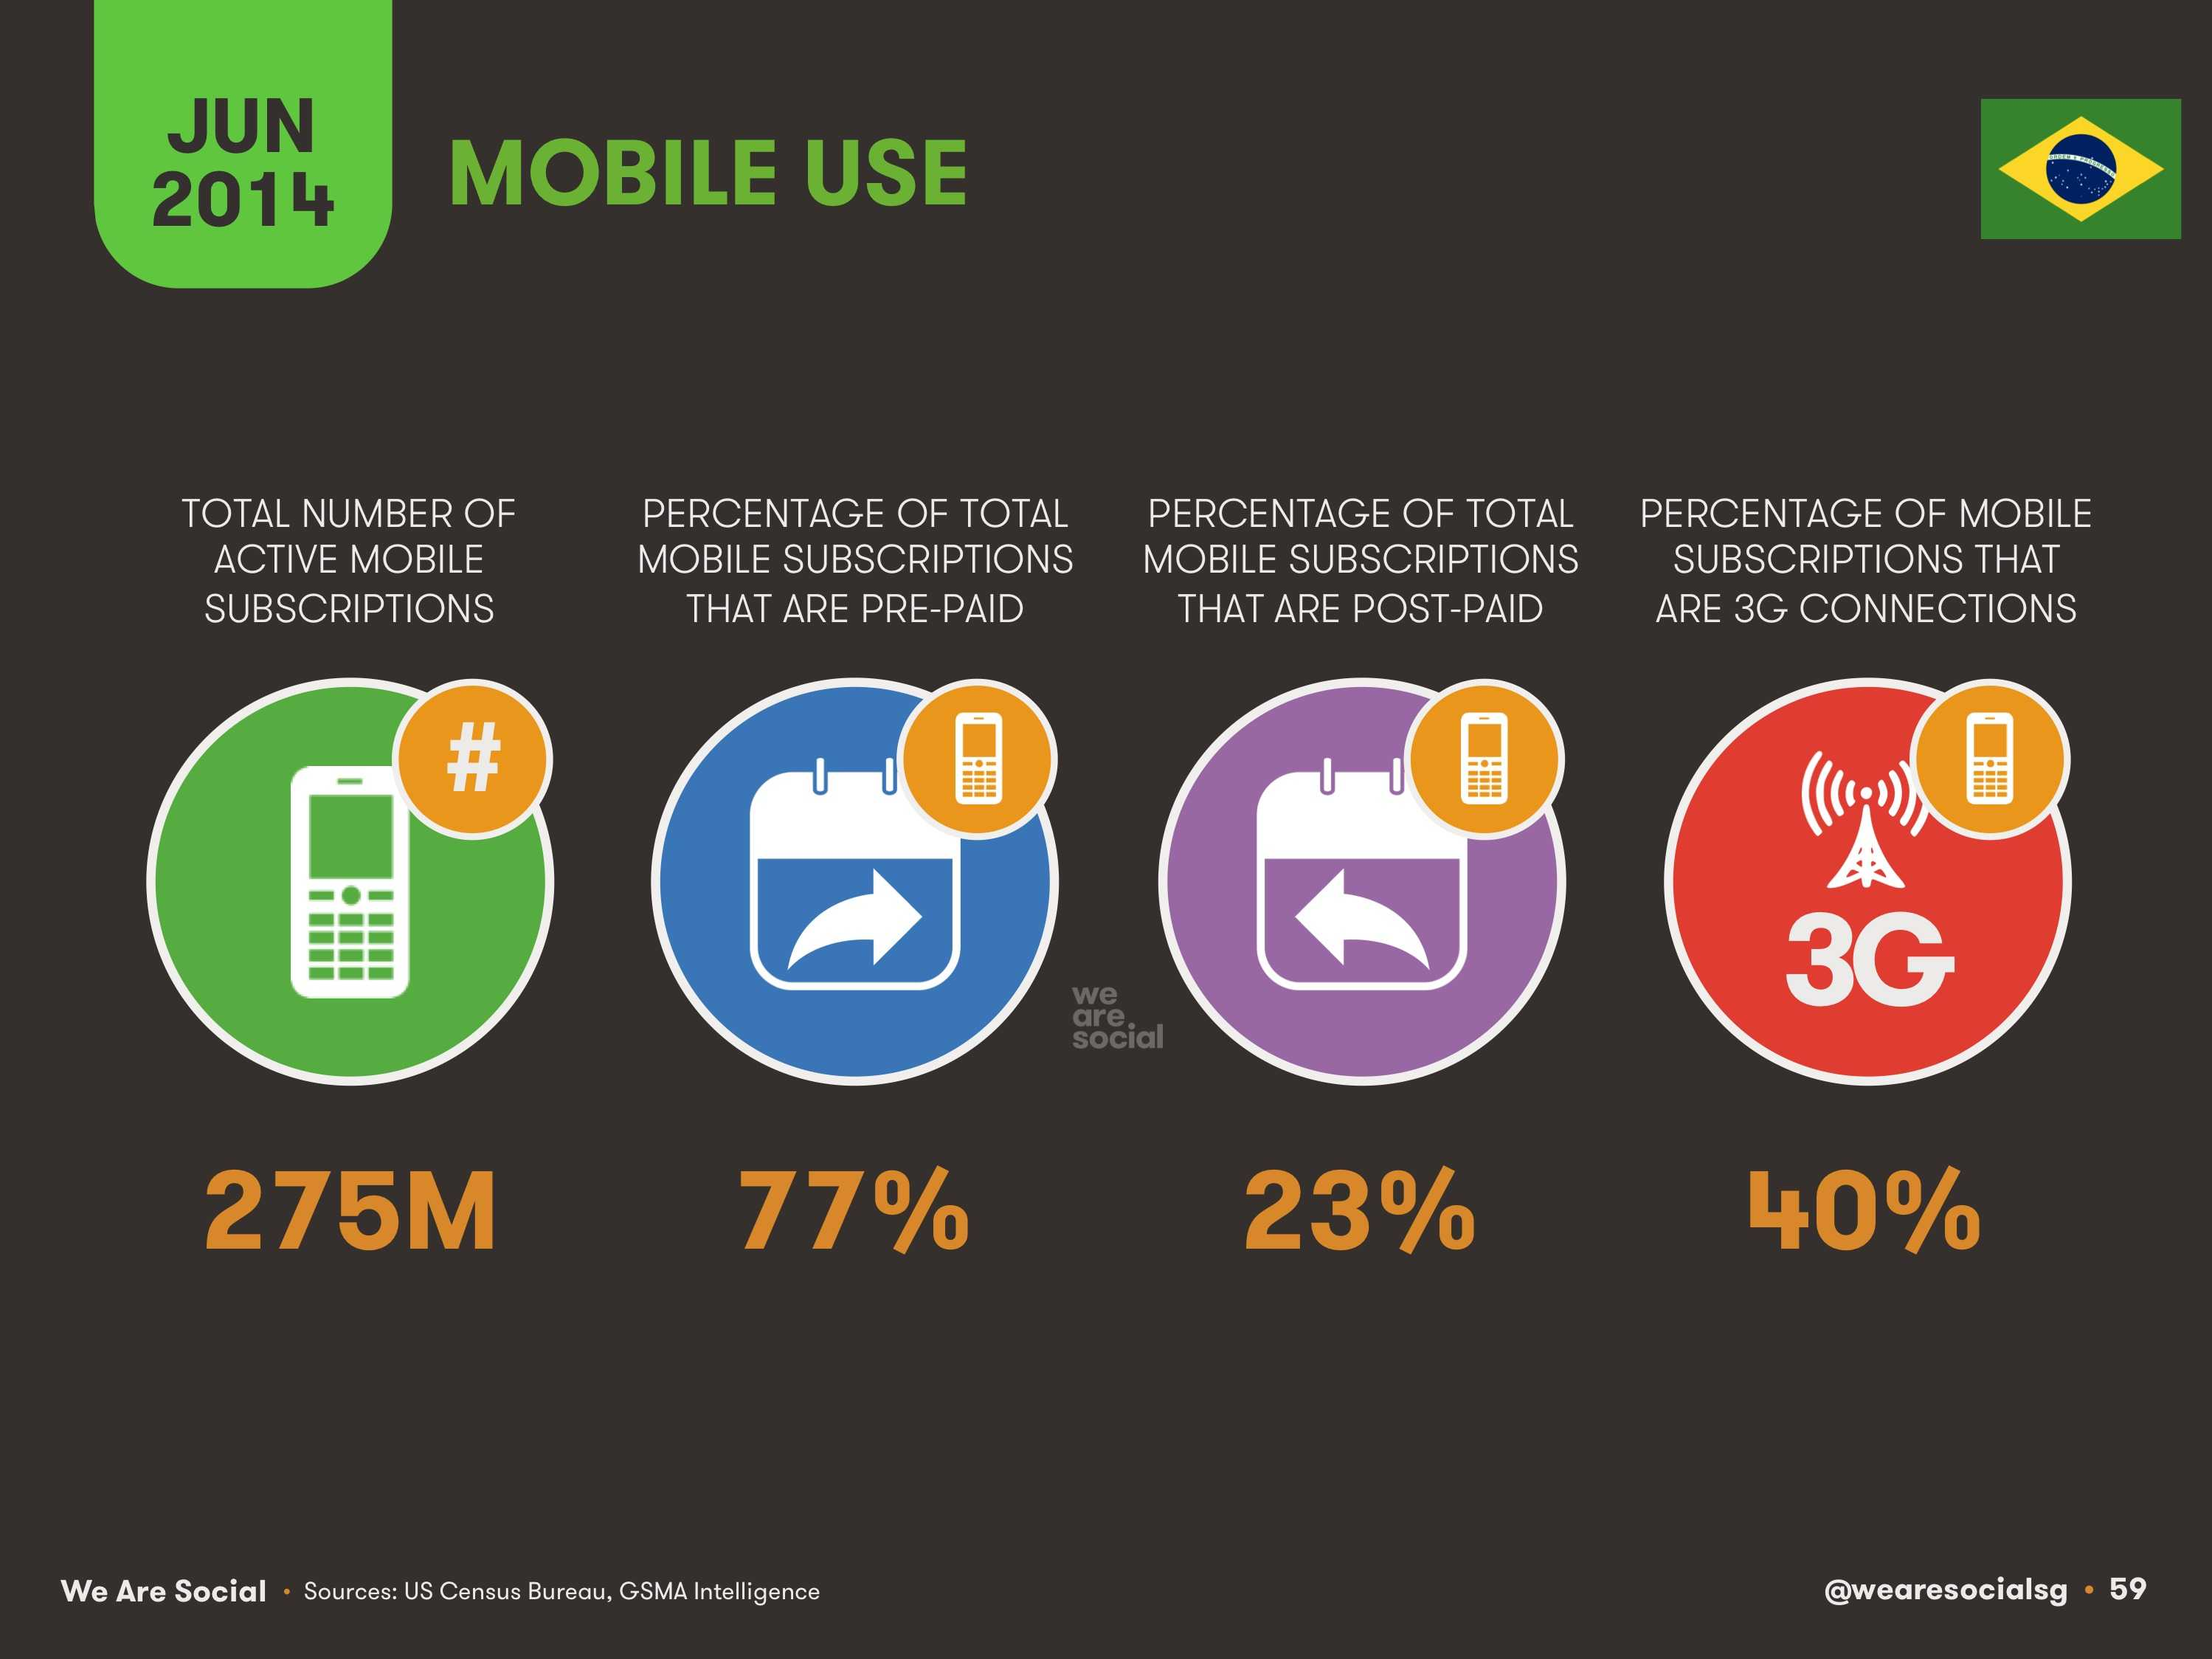 59-Mobile-Use-in-Brazil-2014-We-Are-Social-1